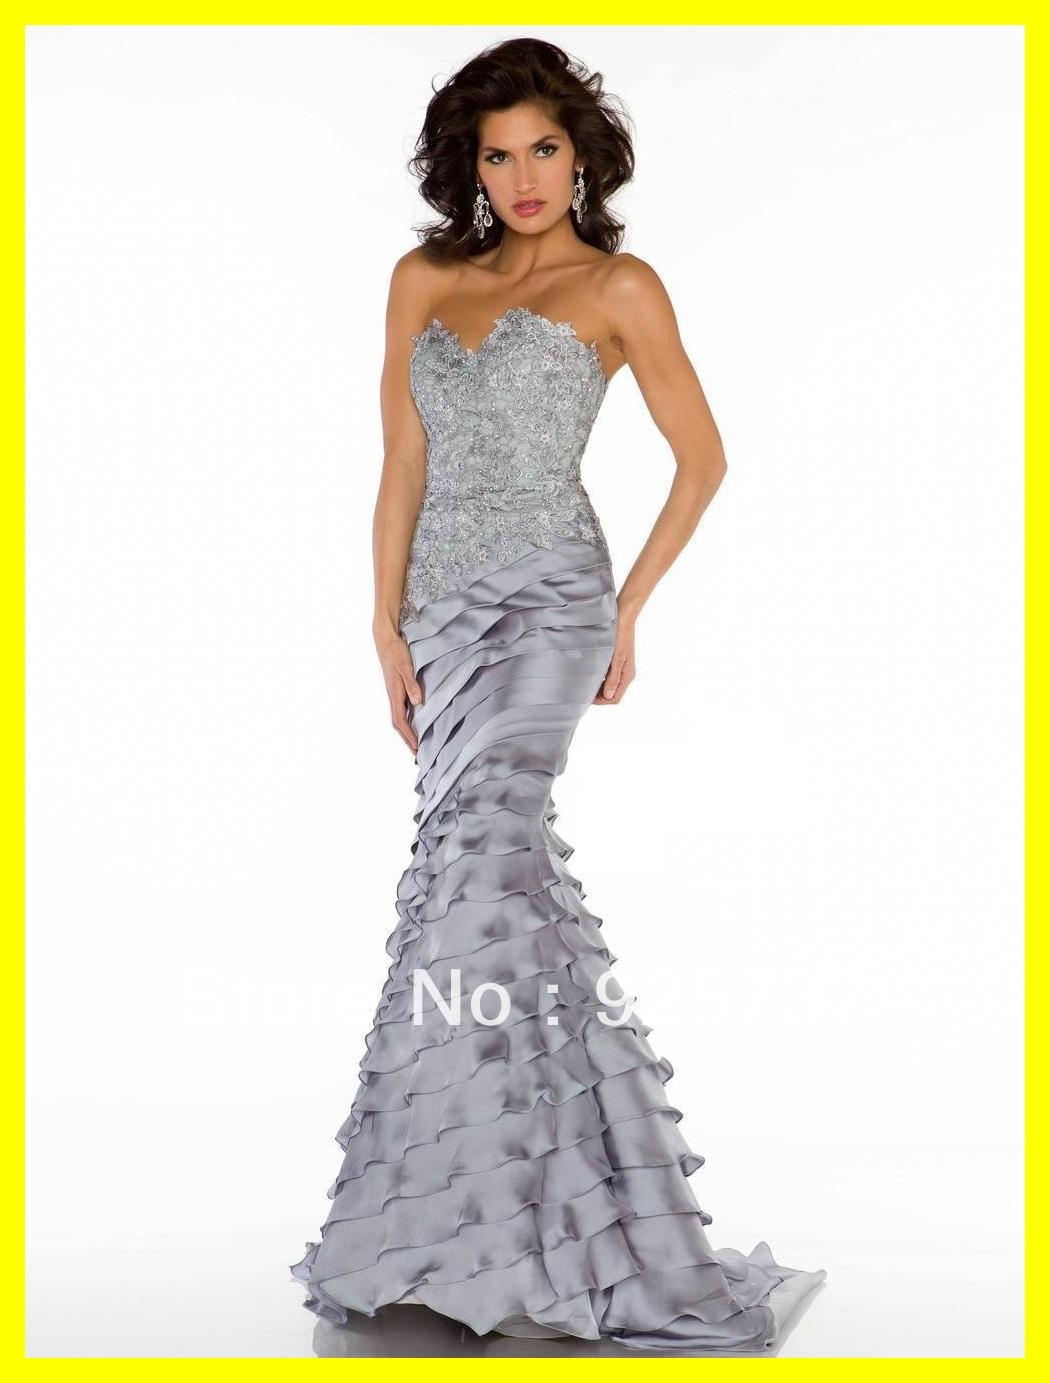 petite plus size evening dresses photo - 1